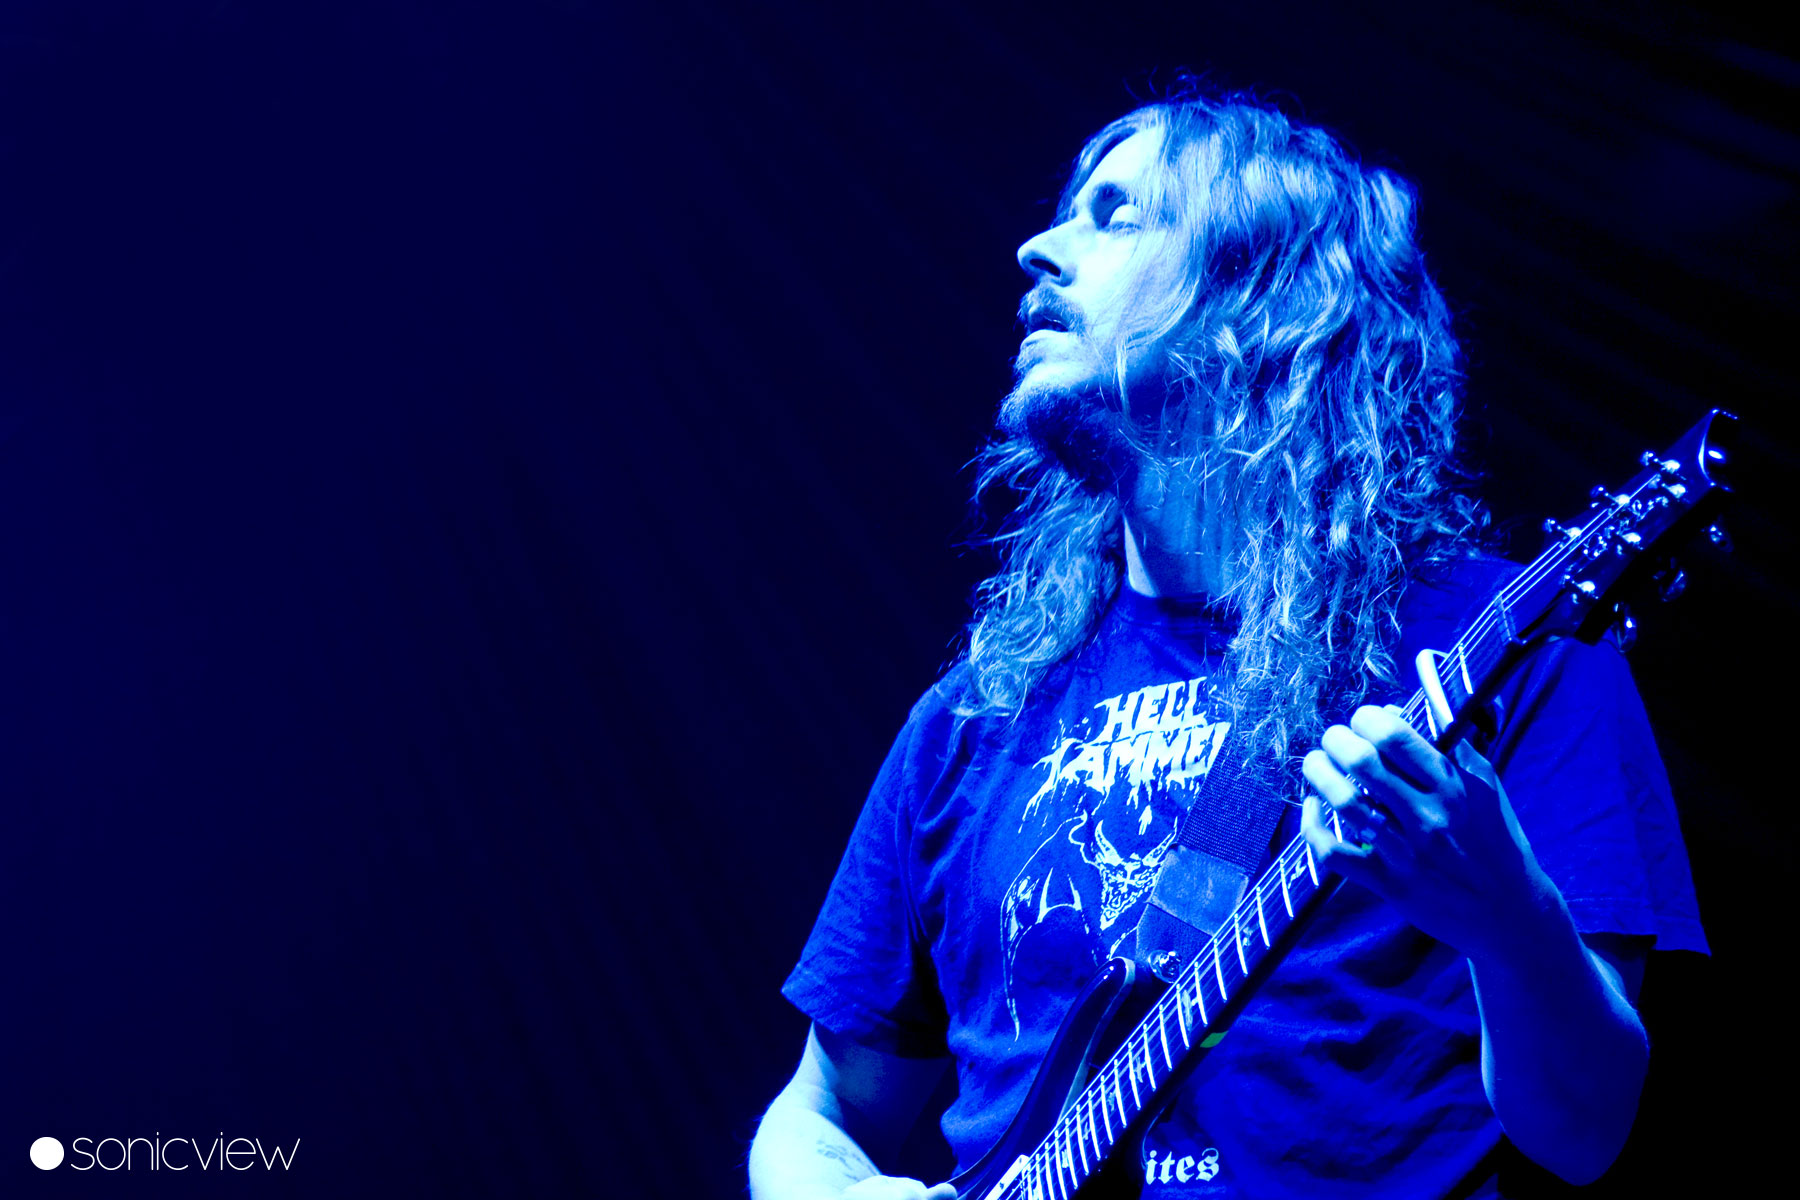 Opeth: Live at KB Hallen 2011, Copenhagen, Denmark